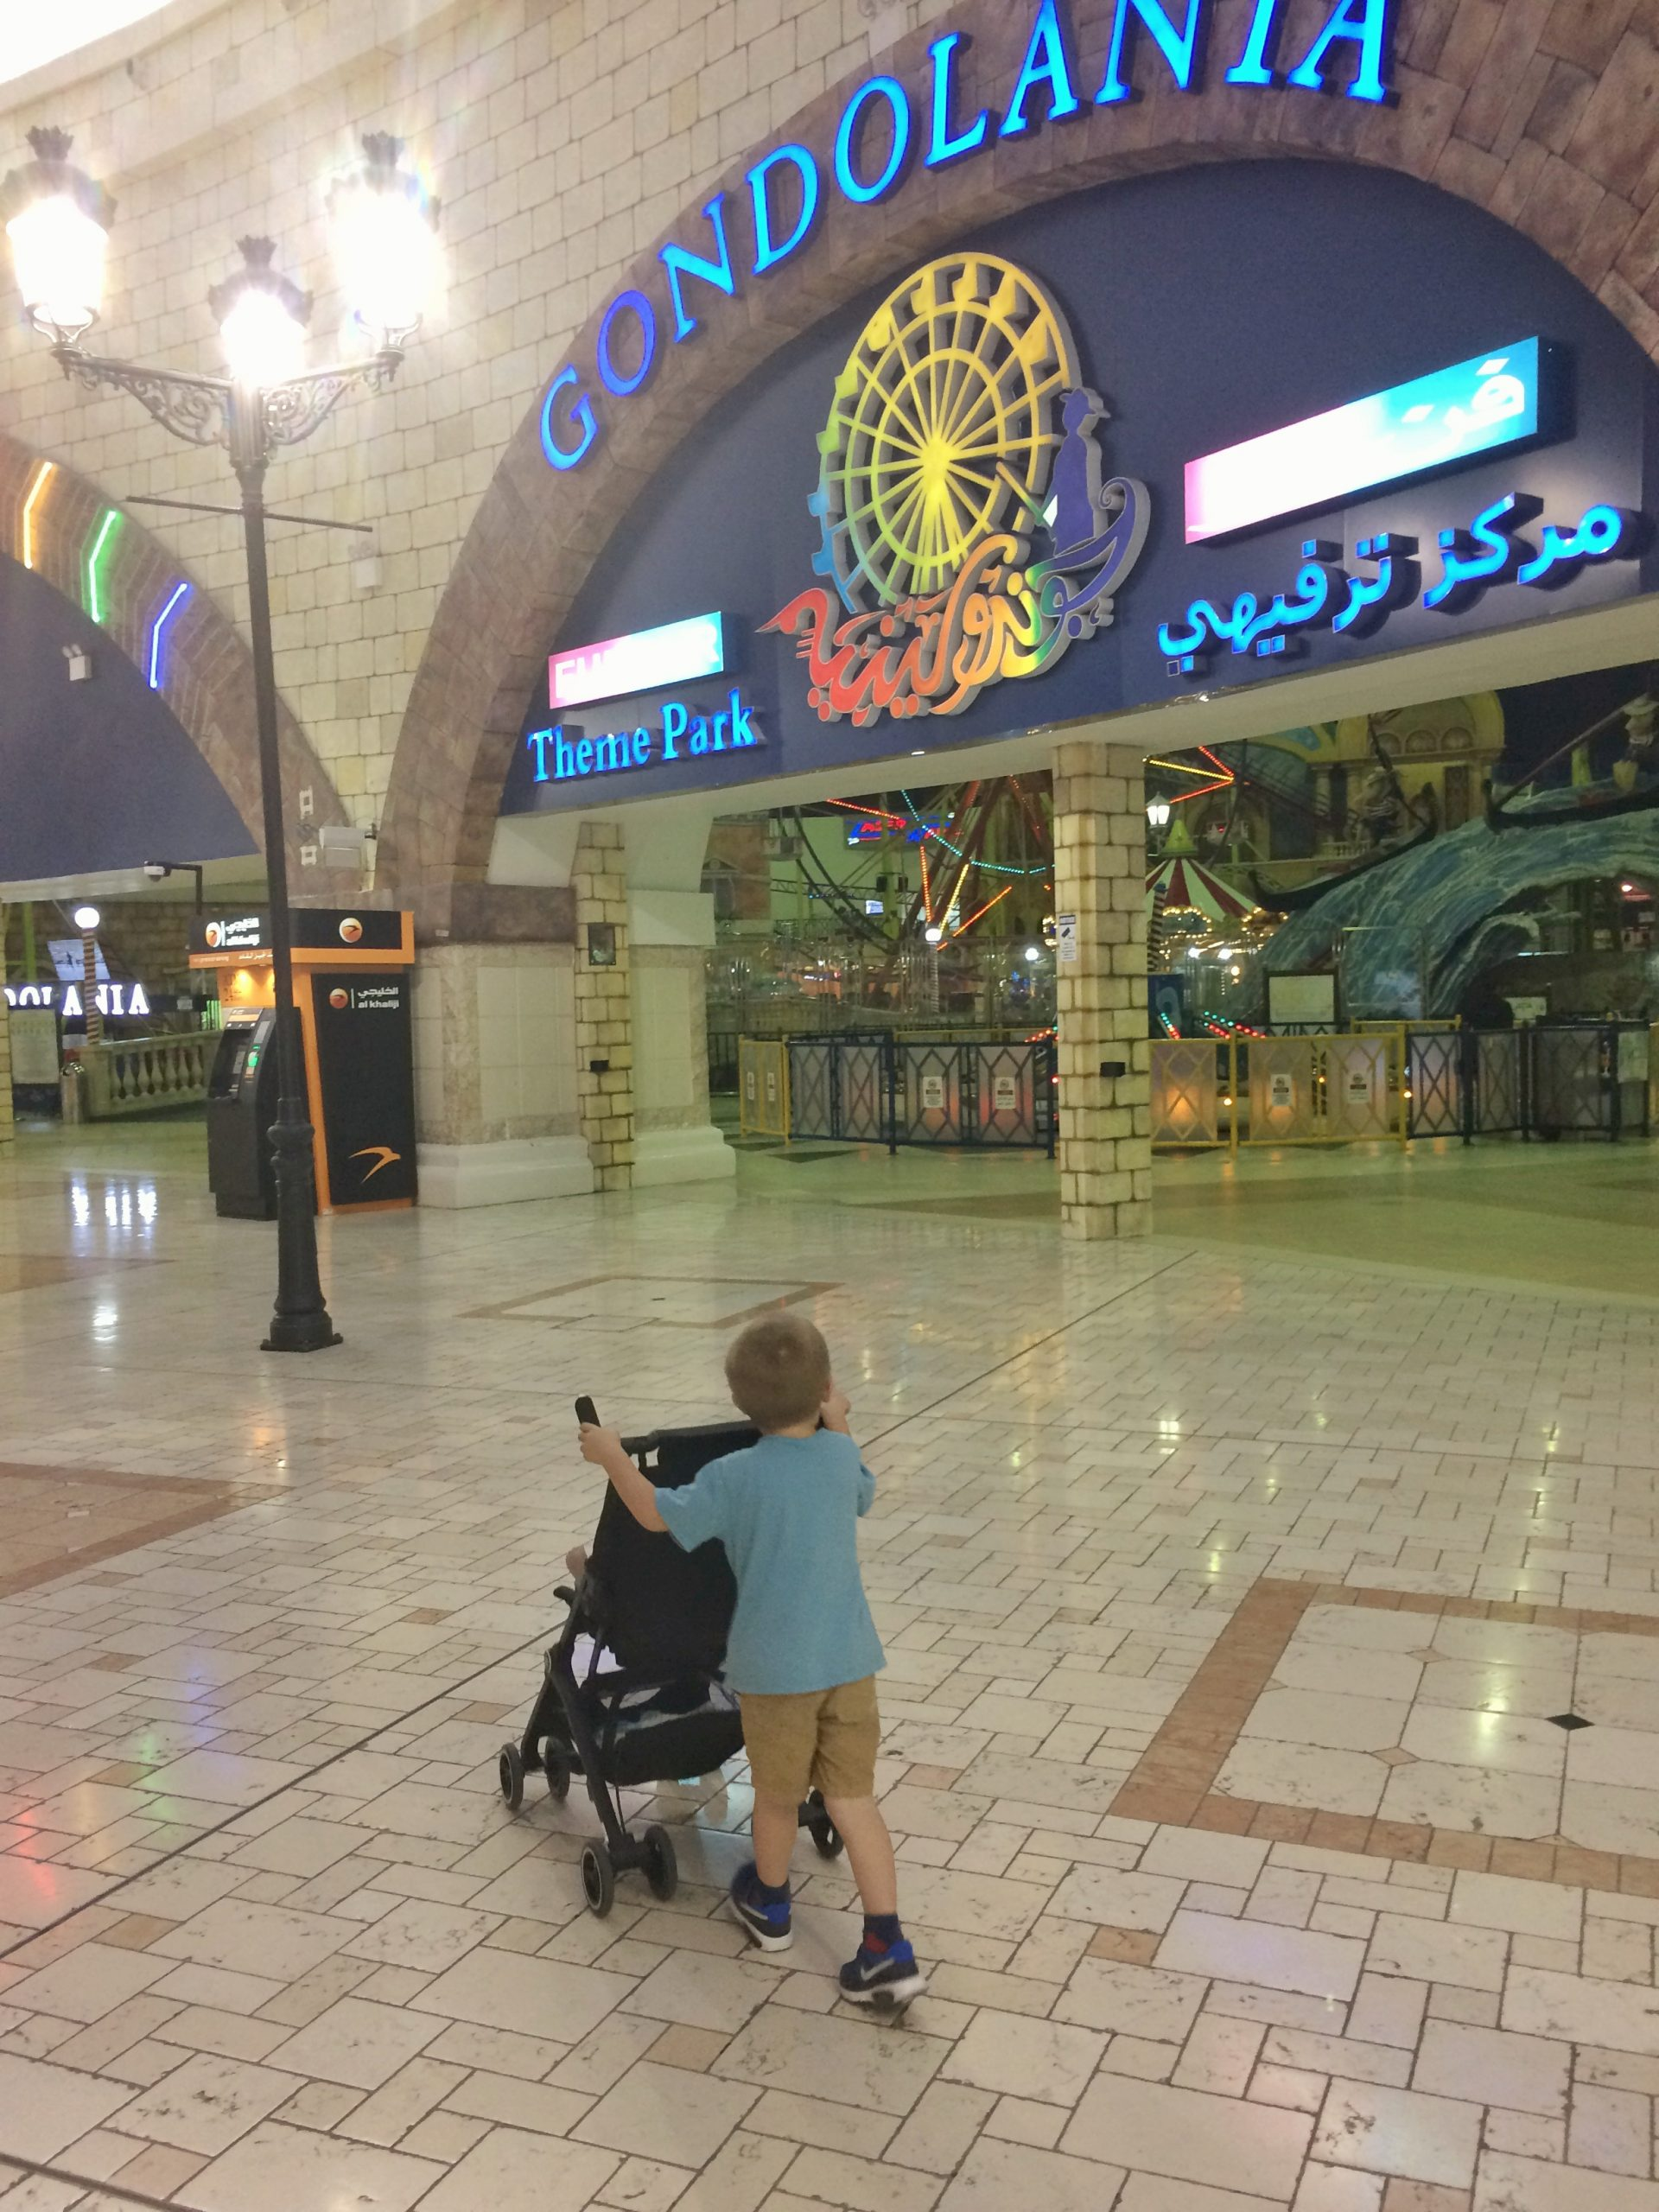 Gondolania in Villagio Mall in Doha, Qatar